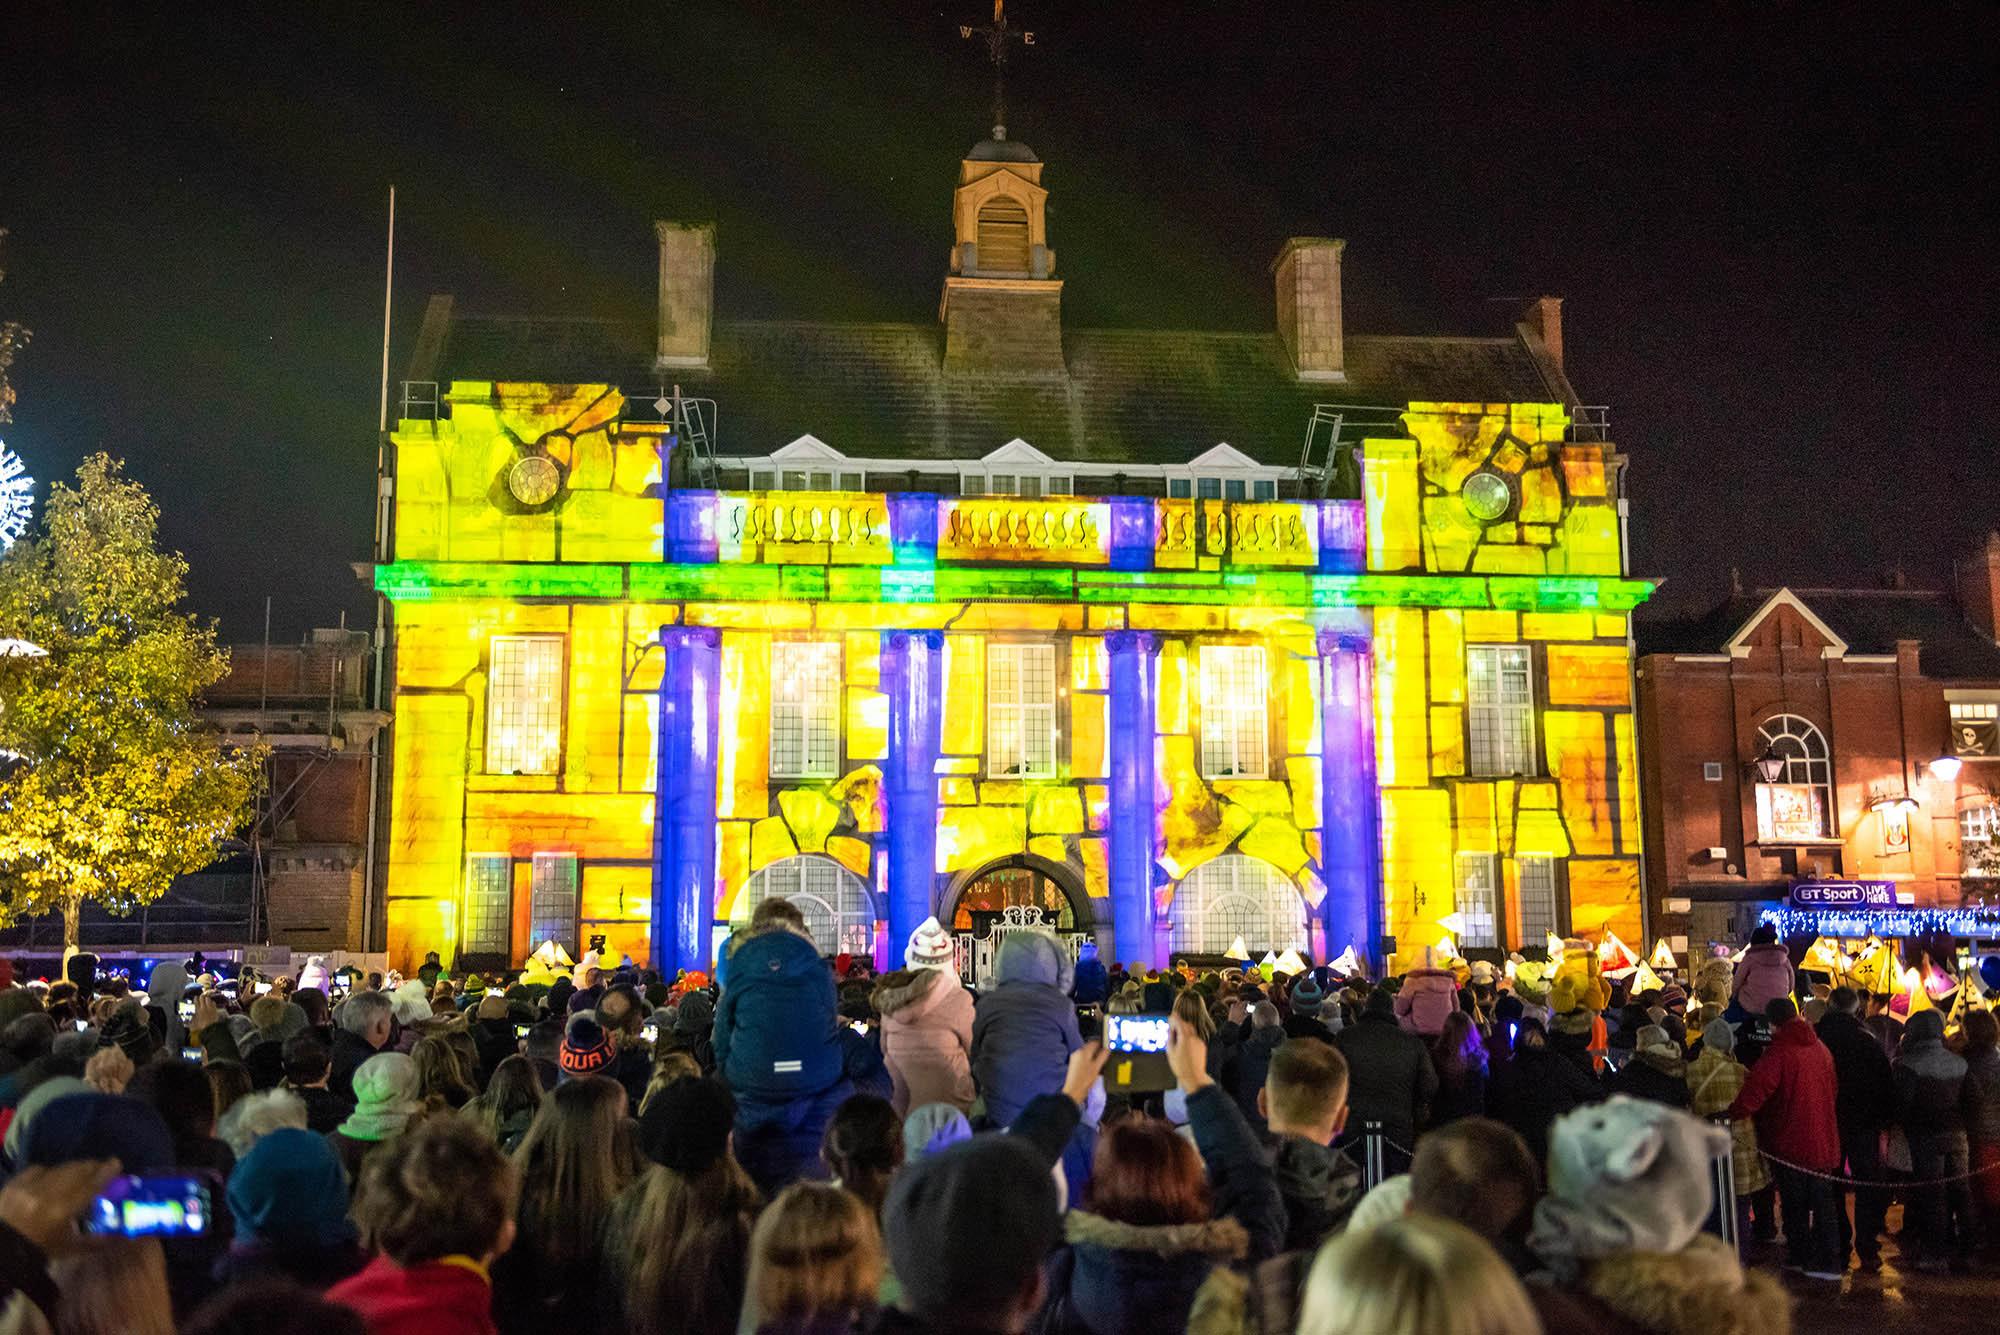 Lumen Light Festival, Projection on Municipal Hall, Christmas show